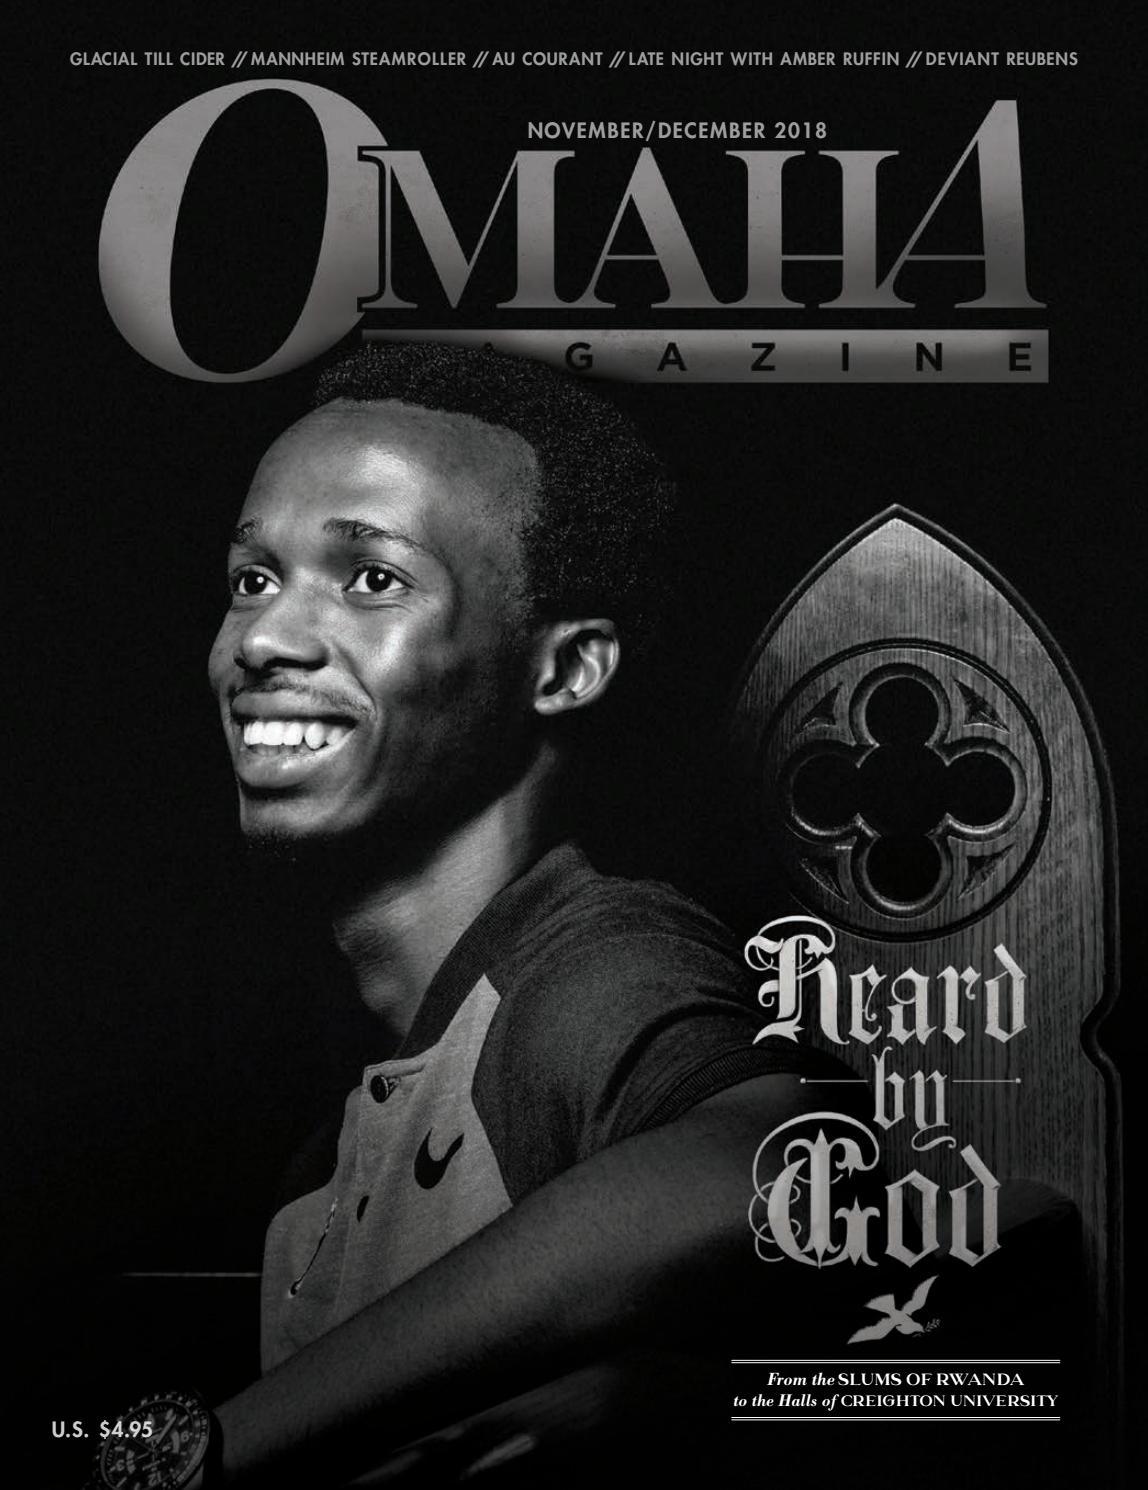 Omaha Magazine - November/December 2018 - The Rwanda Issue